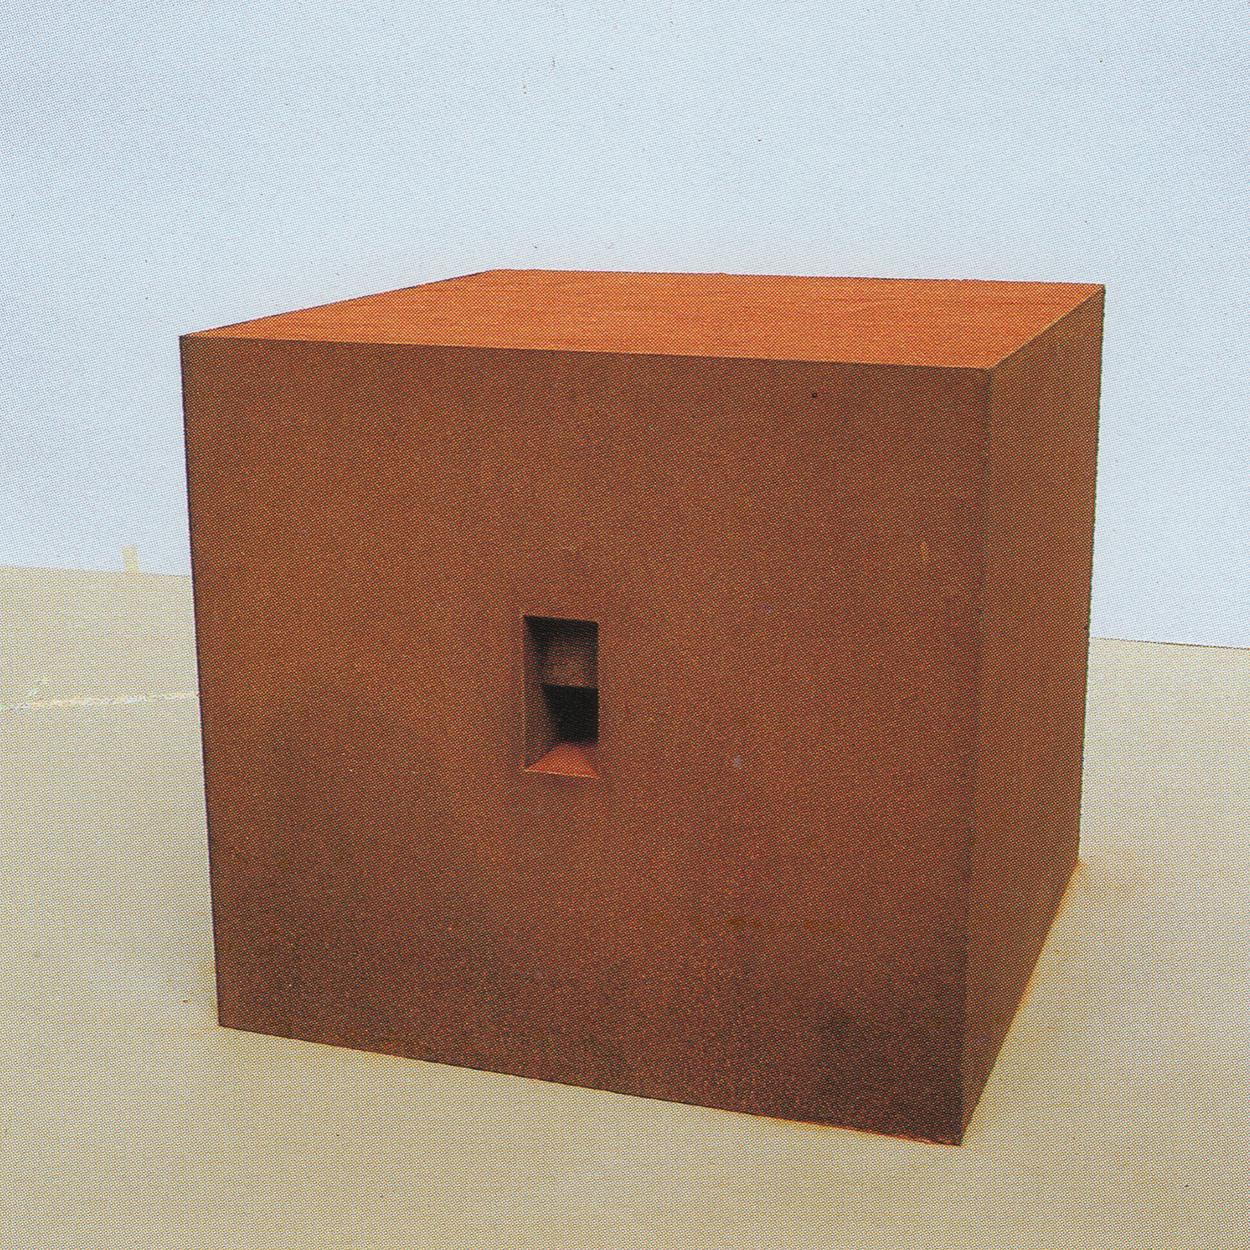 Dark Room|iron and red sand|42 x 46 x 46 cm|1992